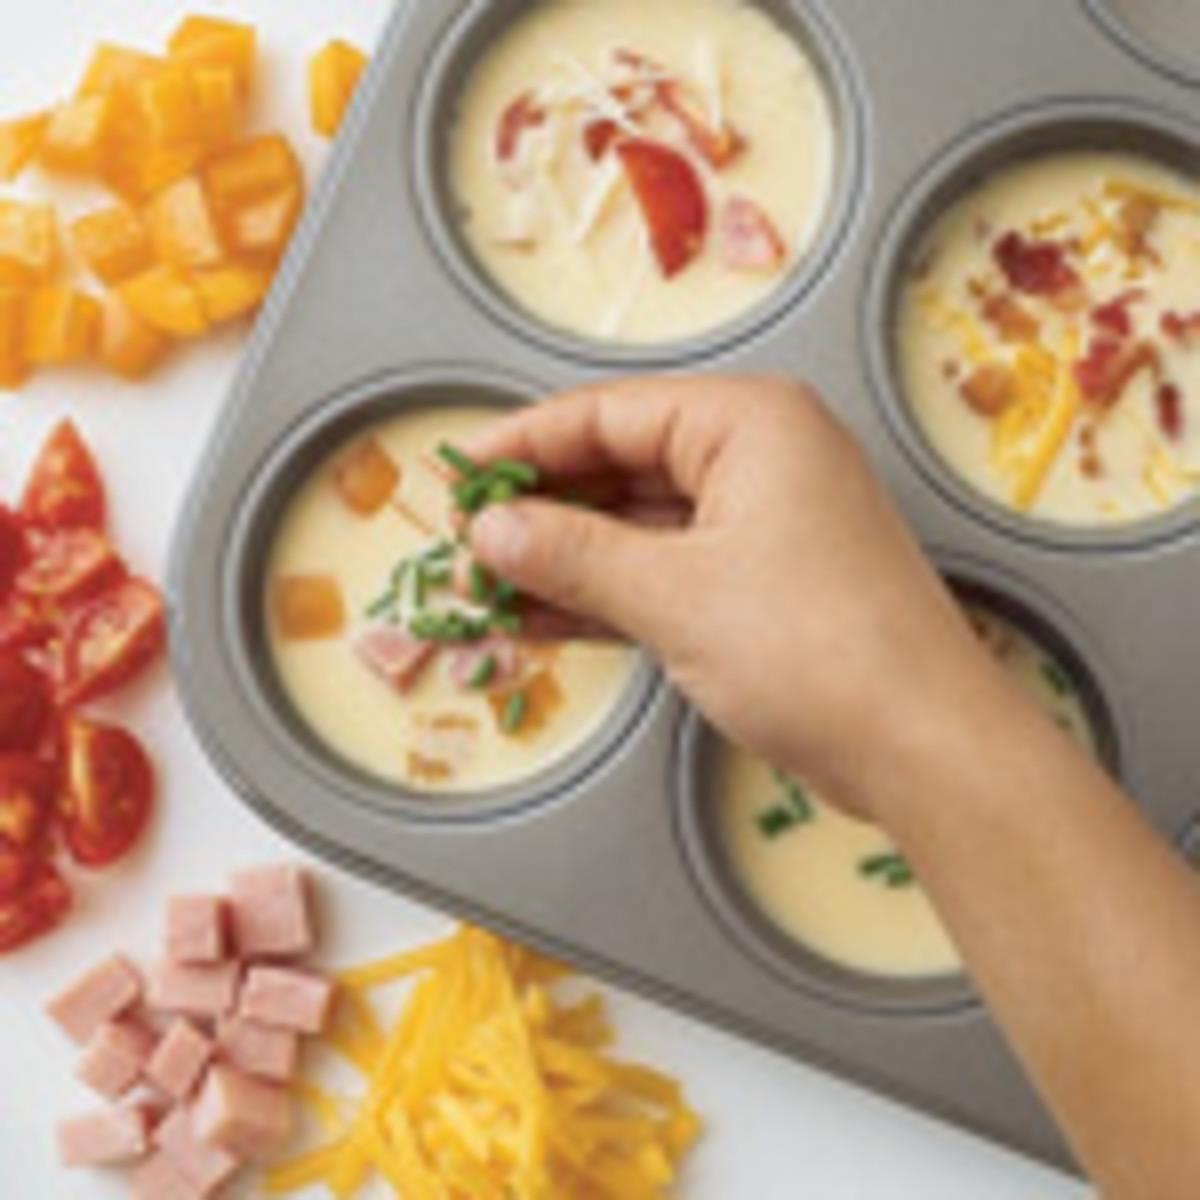 Mini Individual Omelettes or Frittatas. Perfect Kids Breakfast Idea